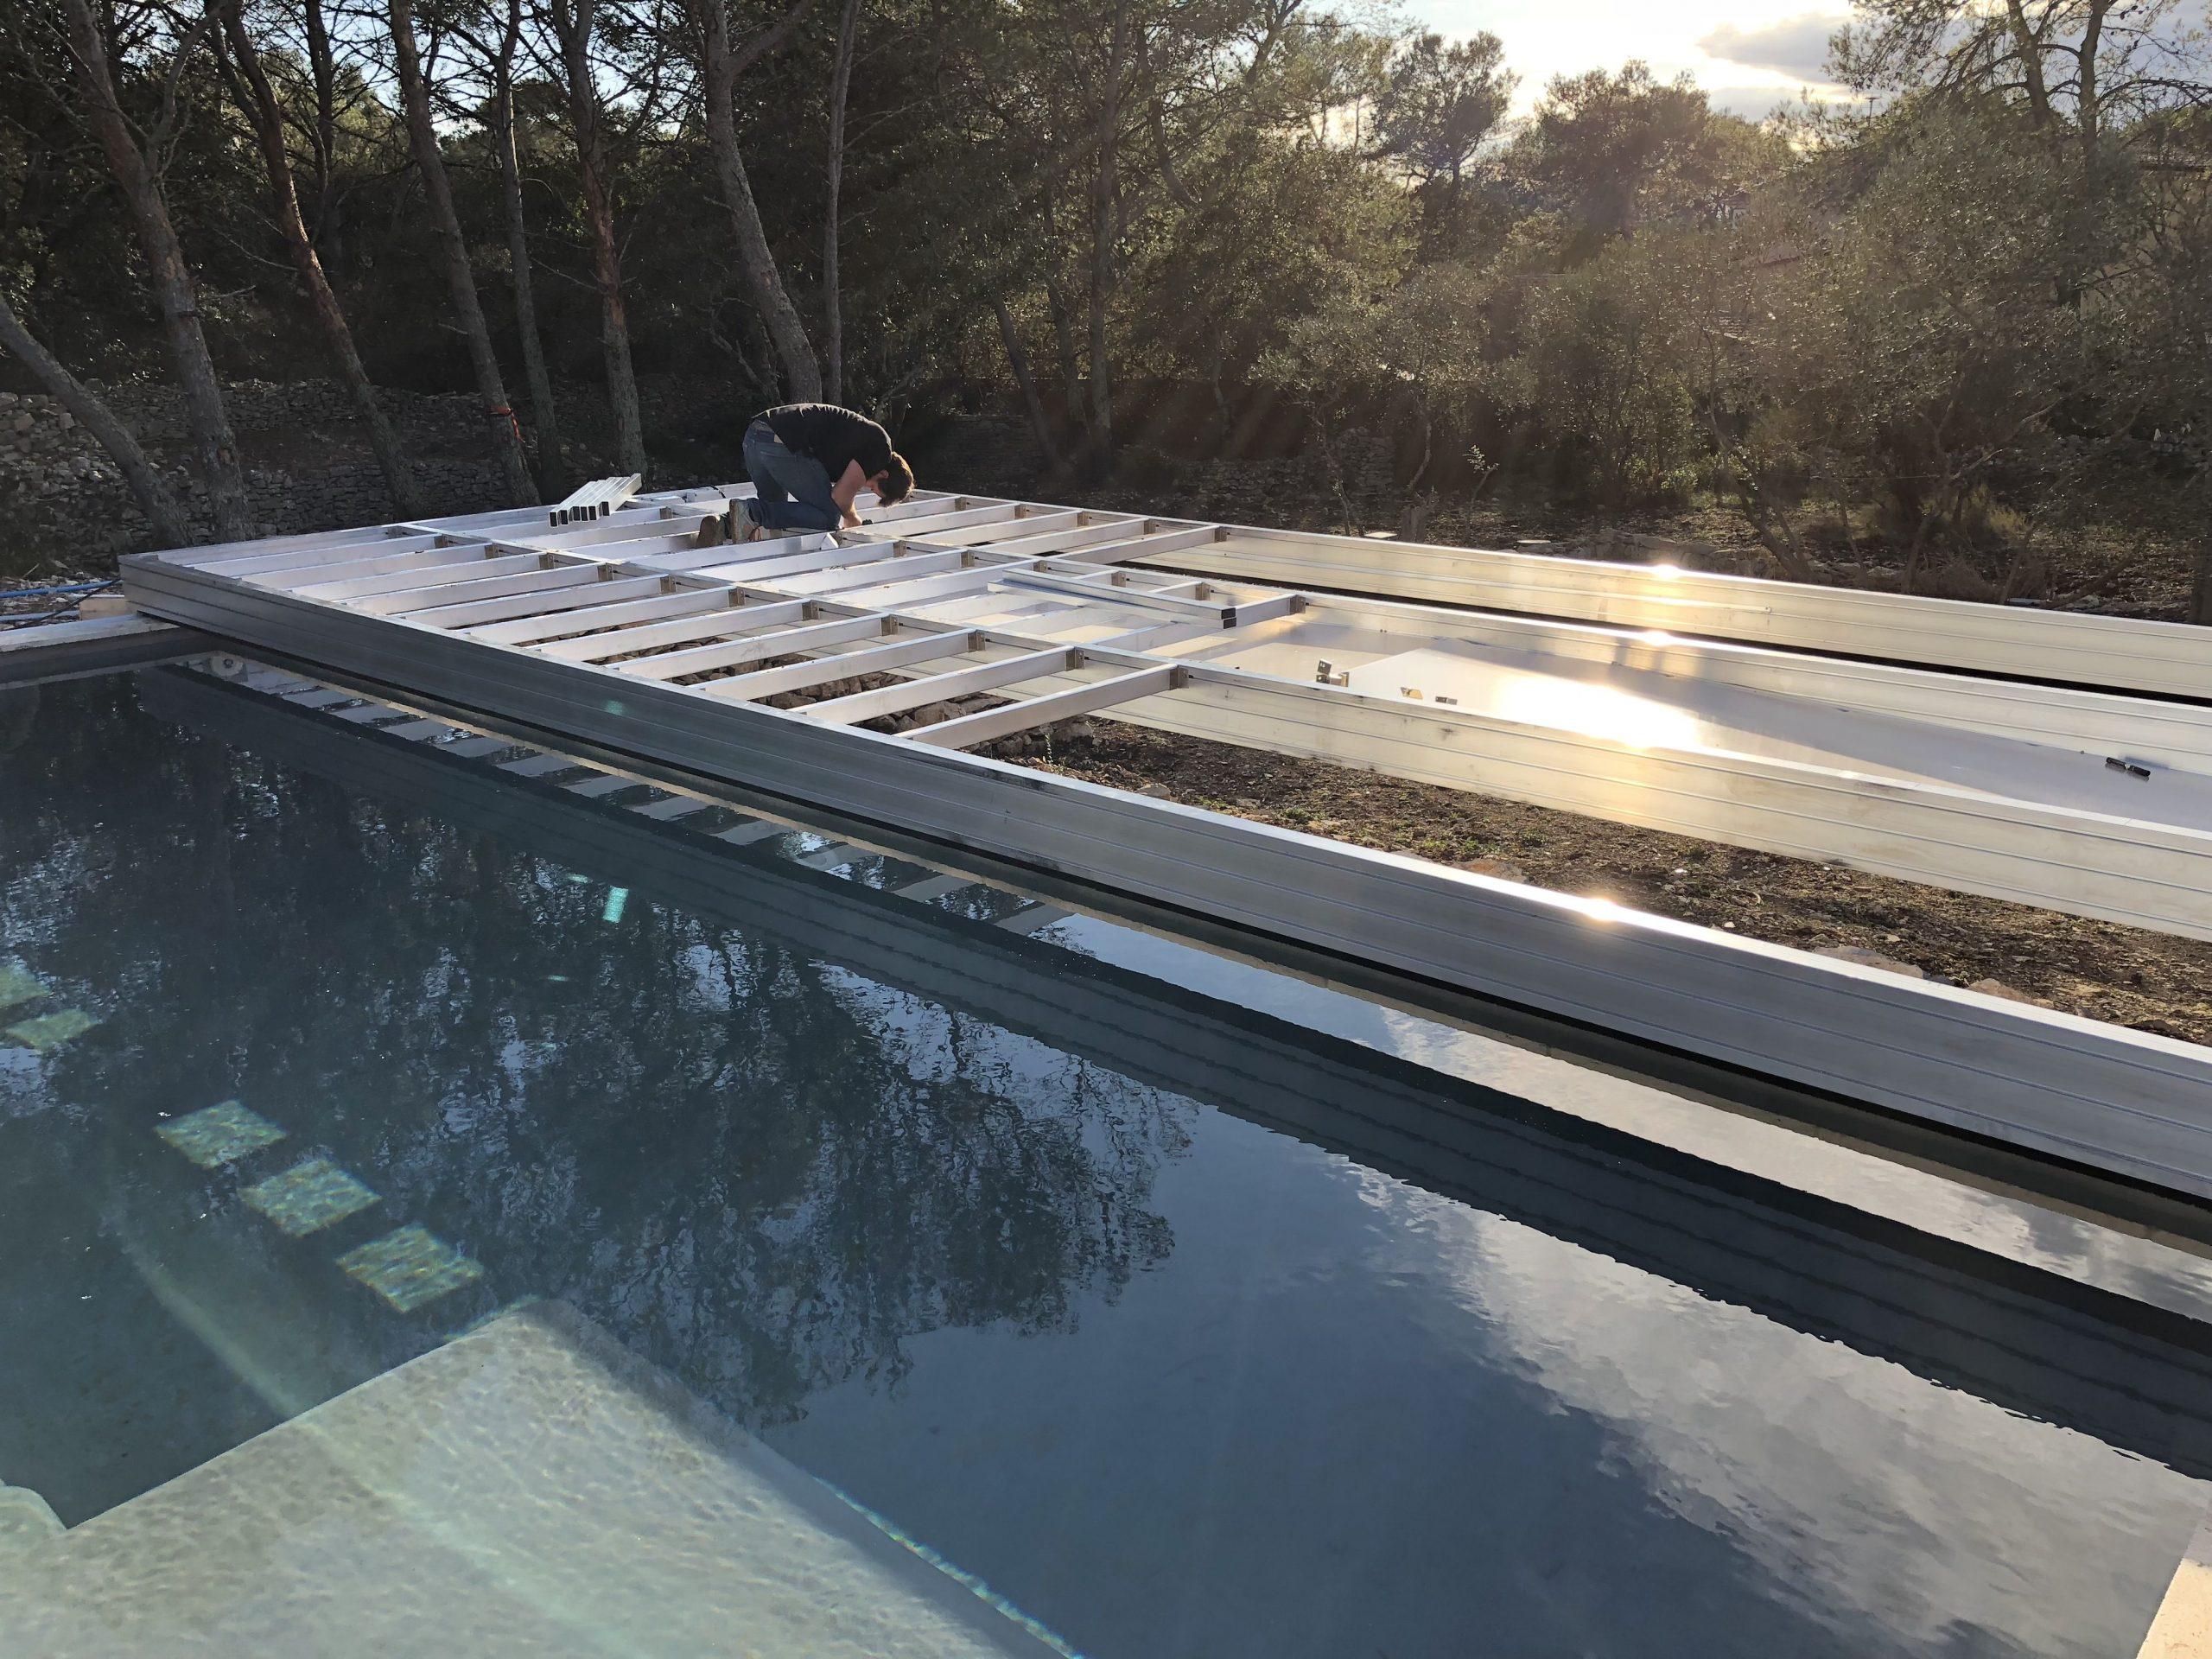 Installation D'une Terrasse Mobile À Nimes | Terrasse Mobile ... avec Fabriquer Une Terrasse Mobile Pour Piscine